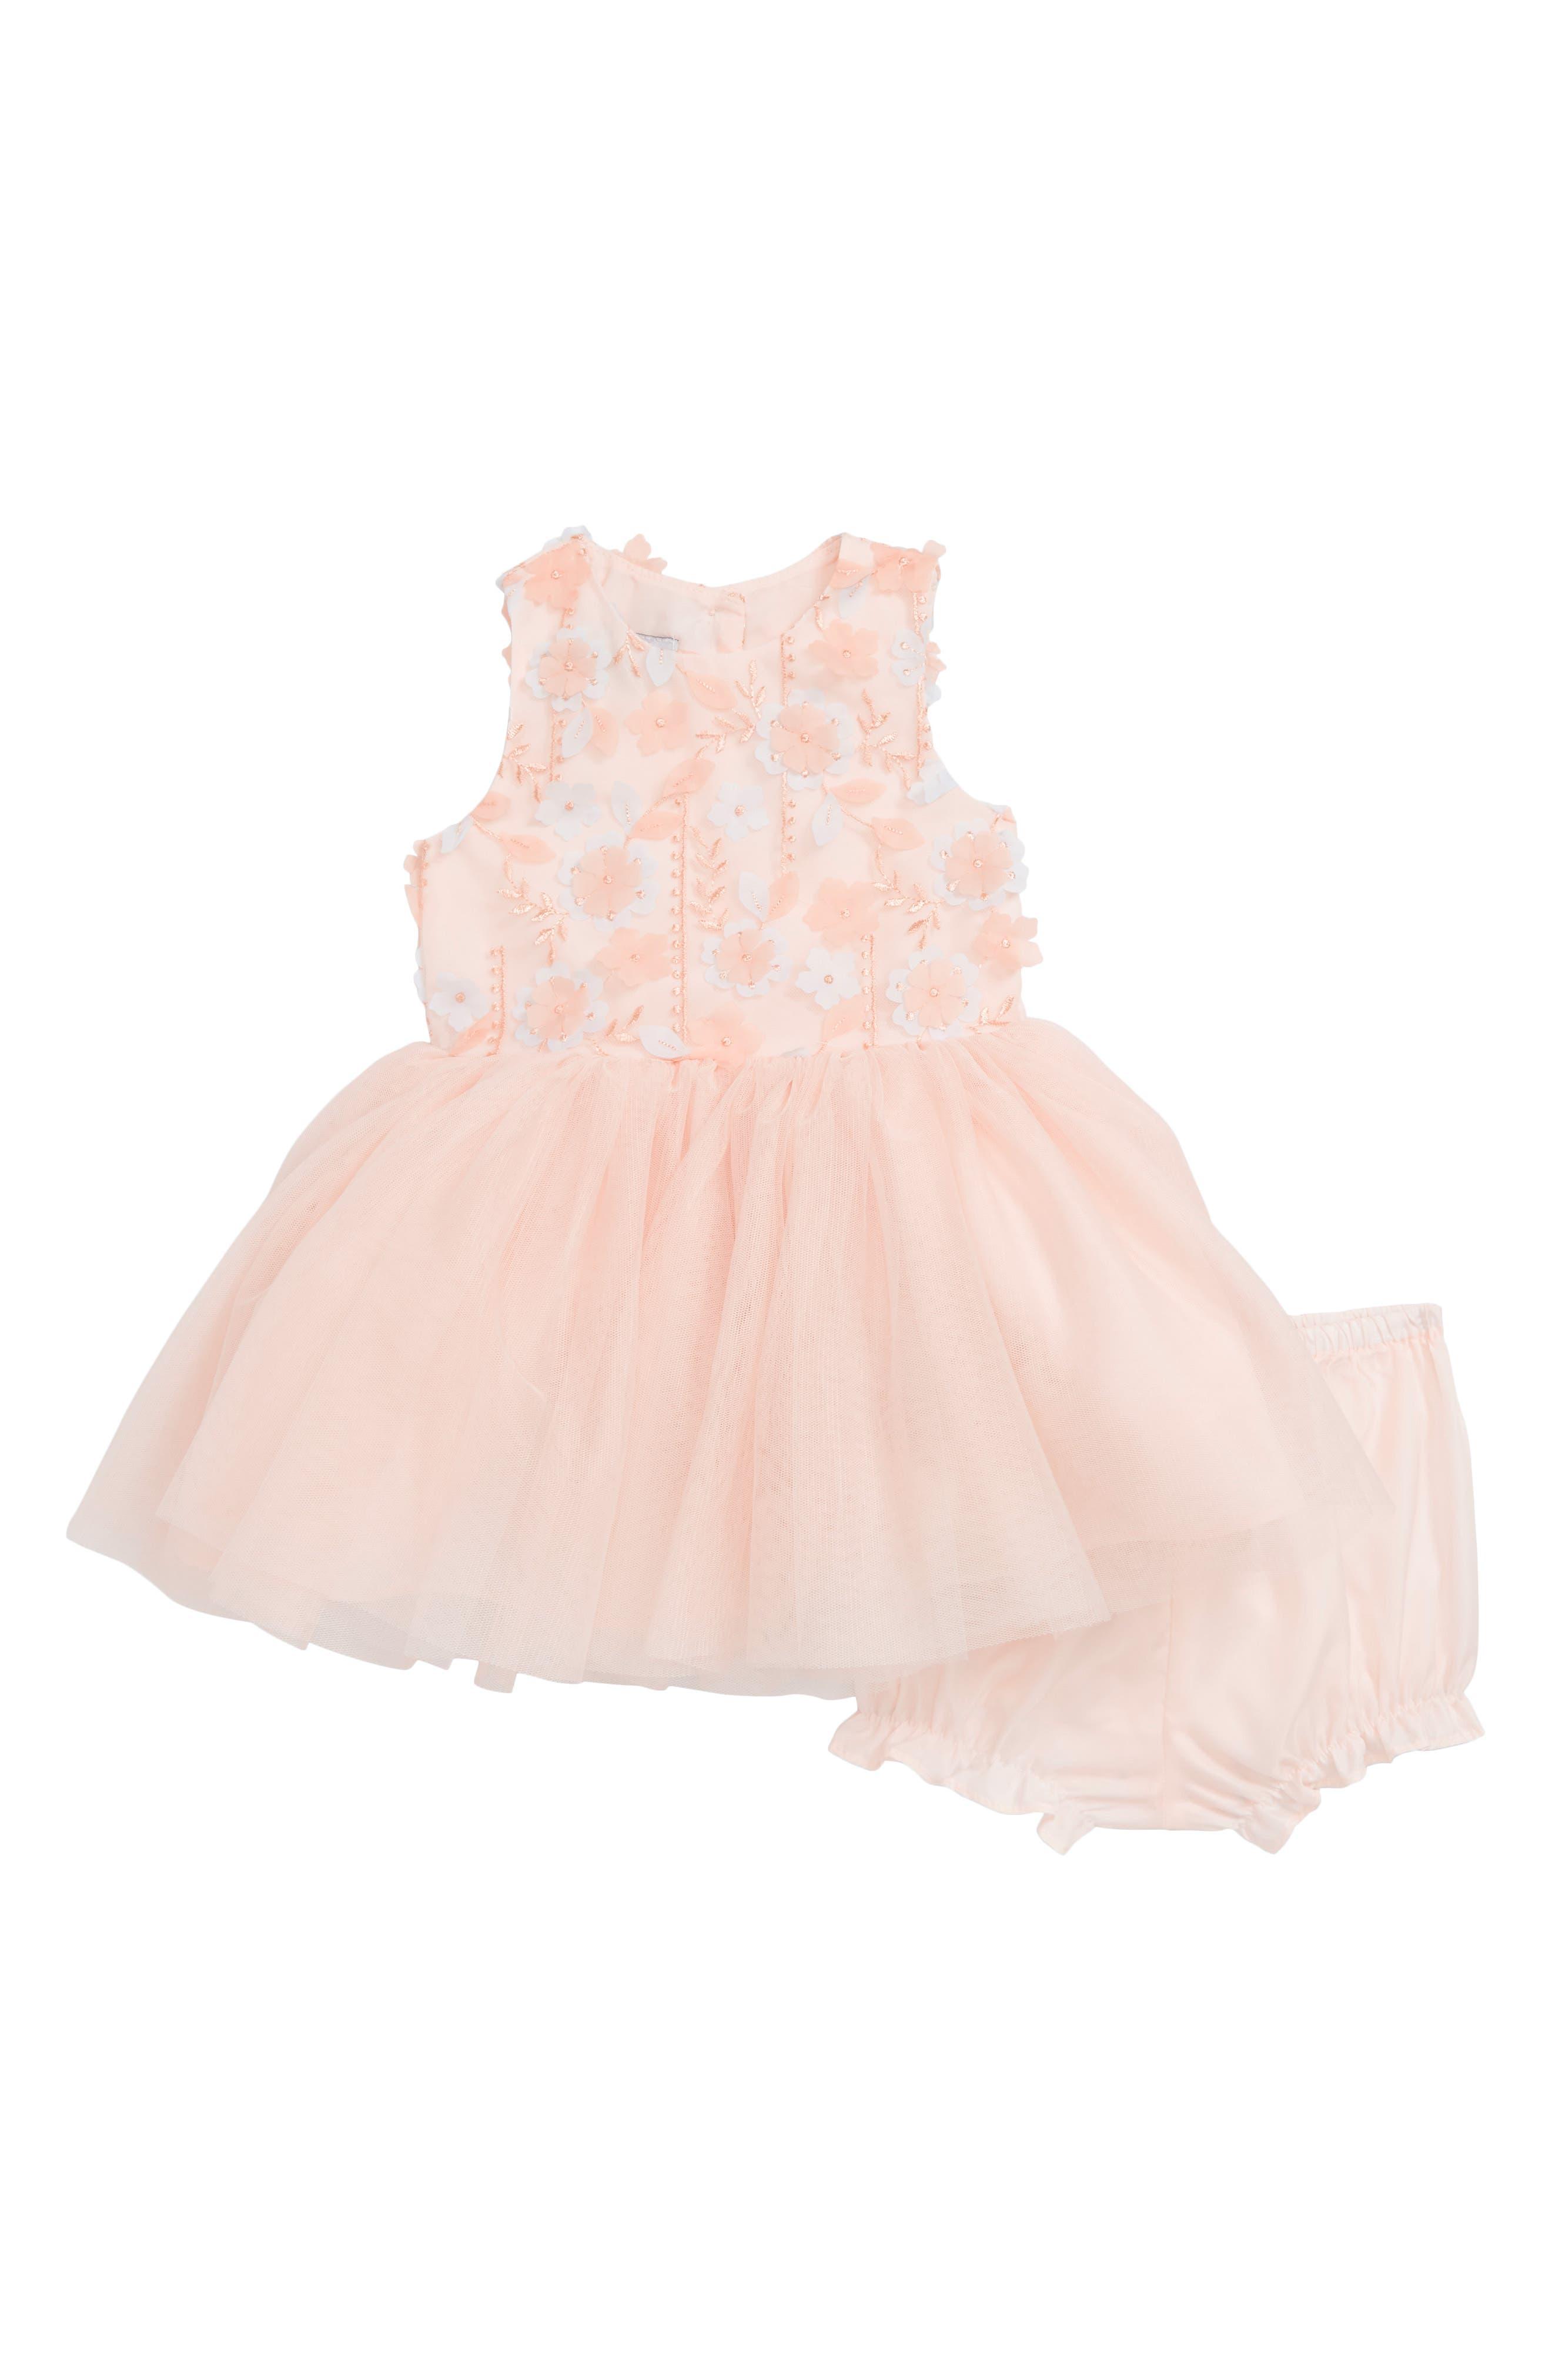 3D Flower Tutu Dress,                             Main thumbnail 1, color,                             950